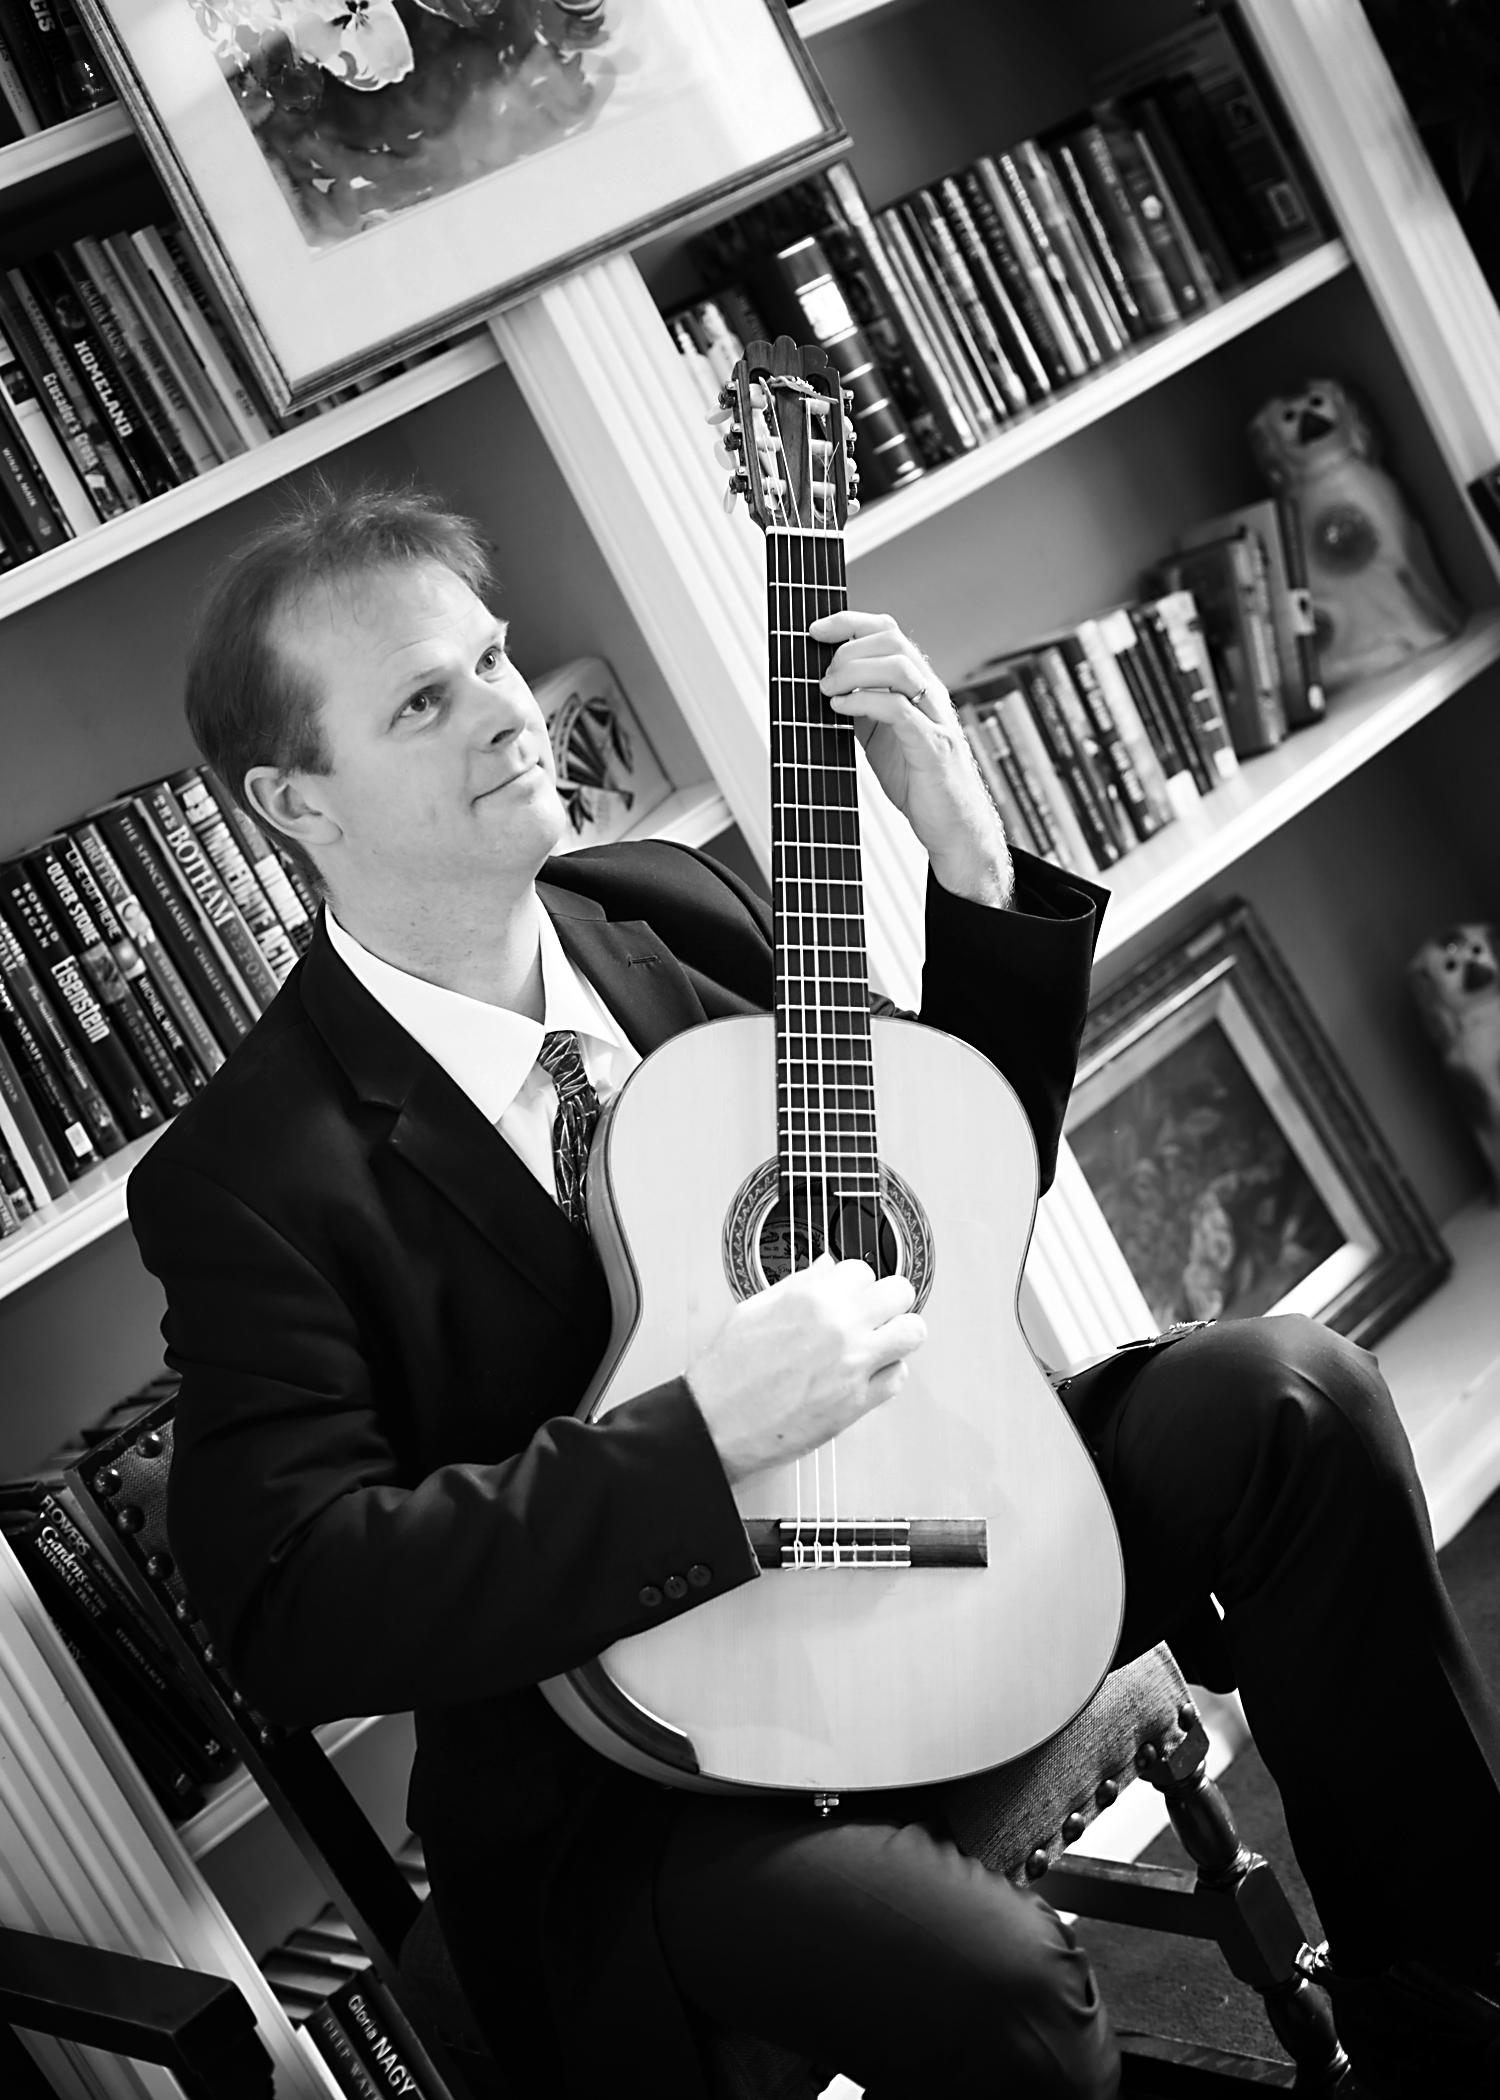 Guitarist playing wedding ceremony